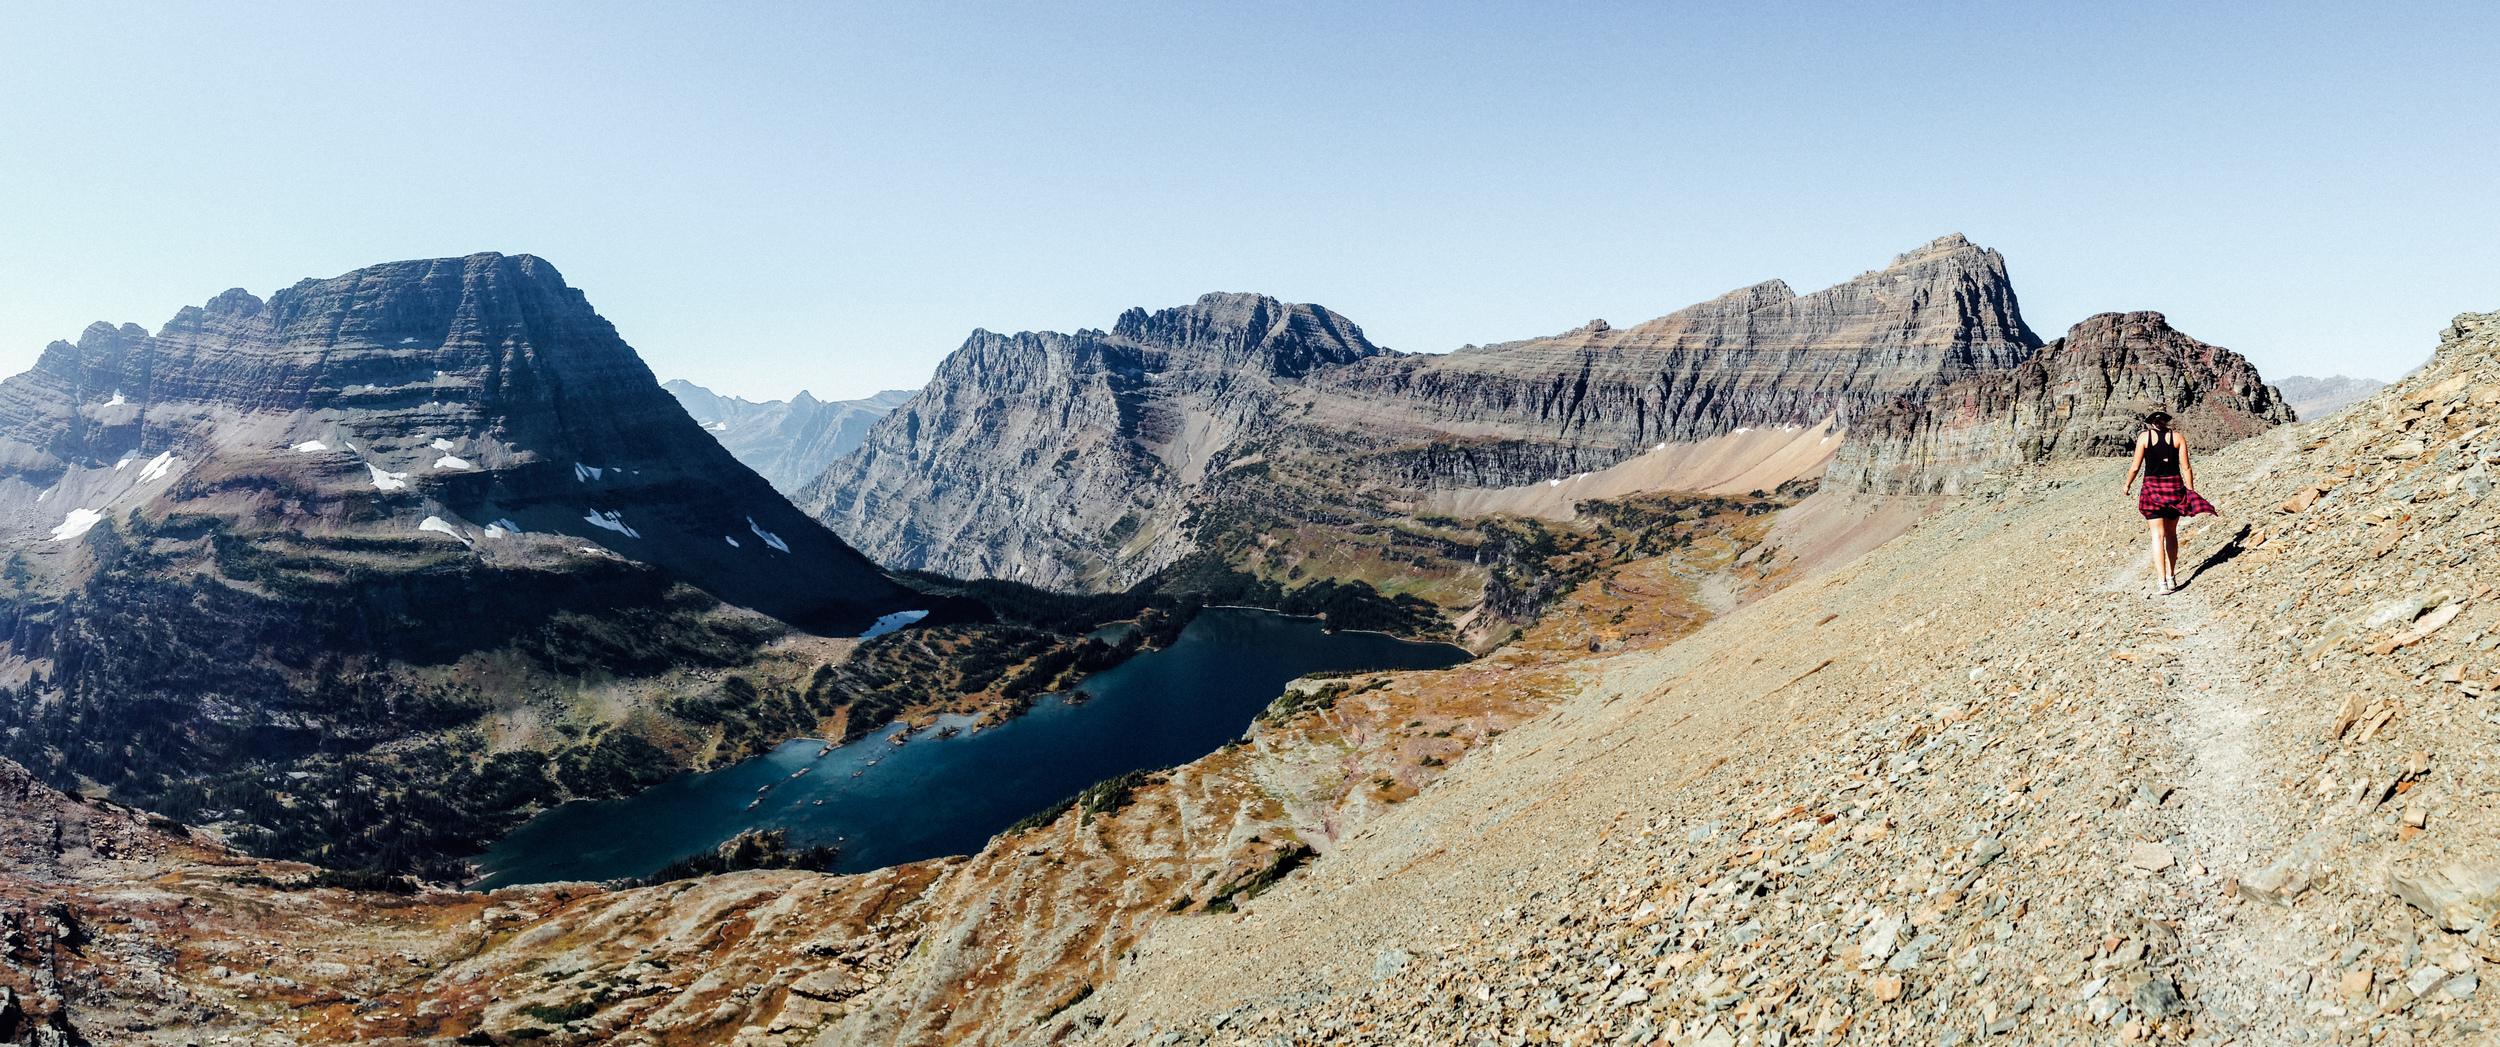 Hiking the ridge above Hidden Lake. Glacier National Park, Montana